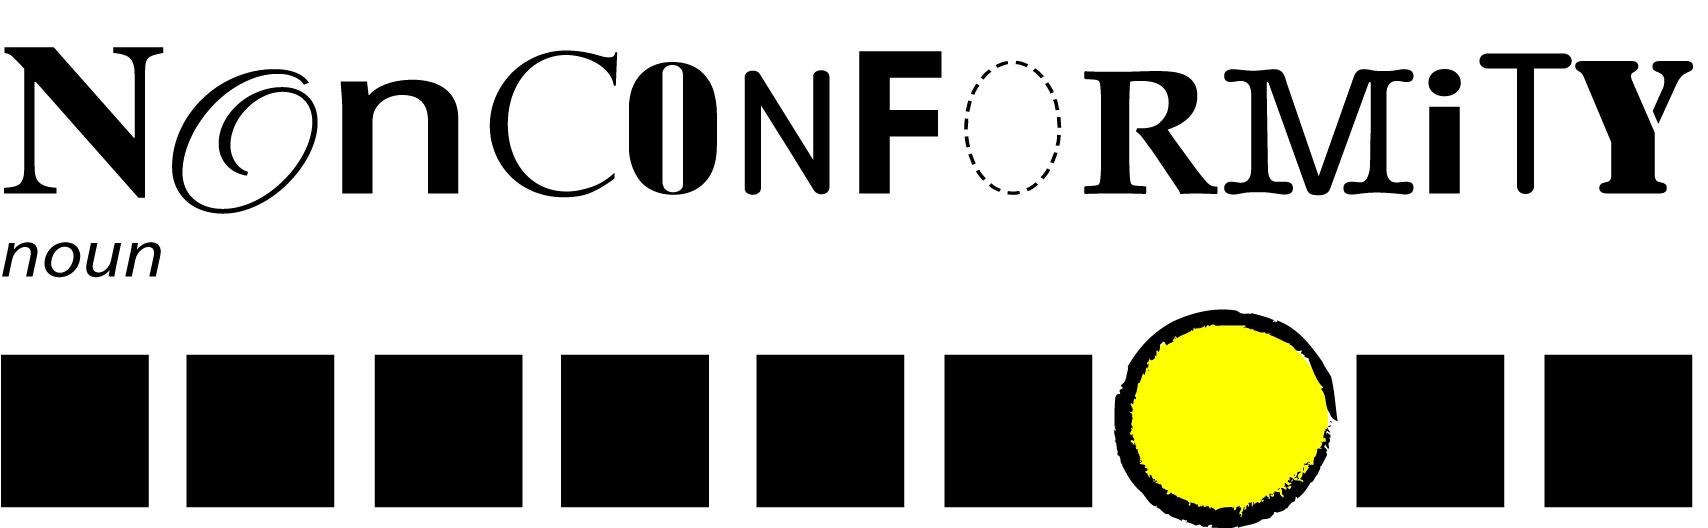 nonconformity-graphic